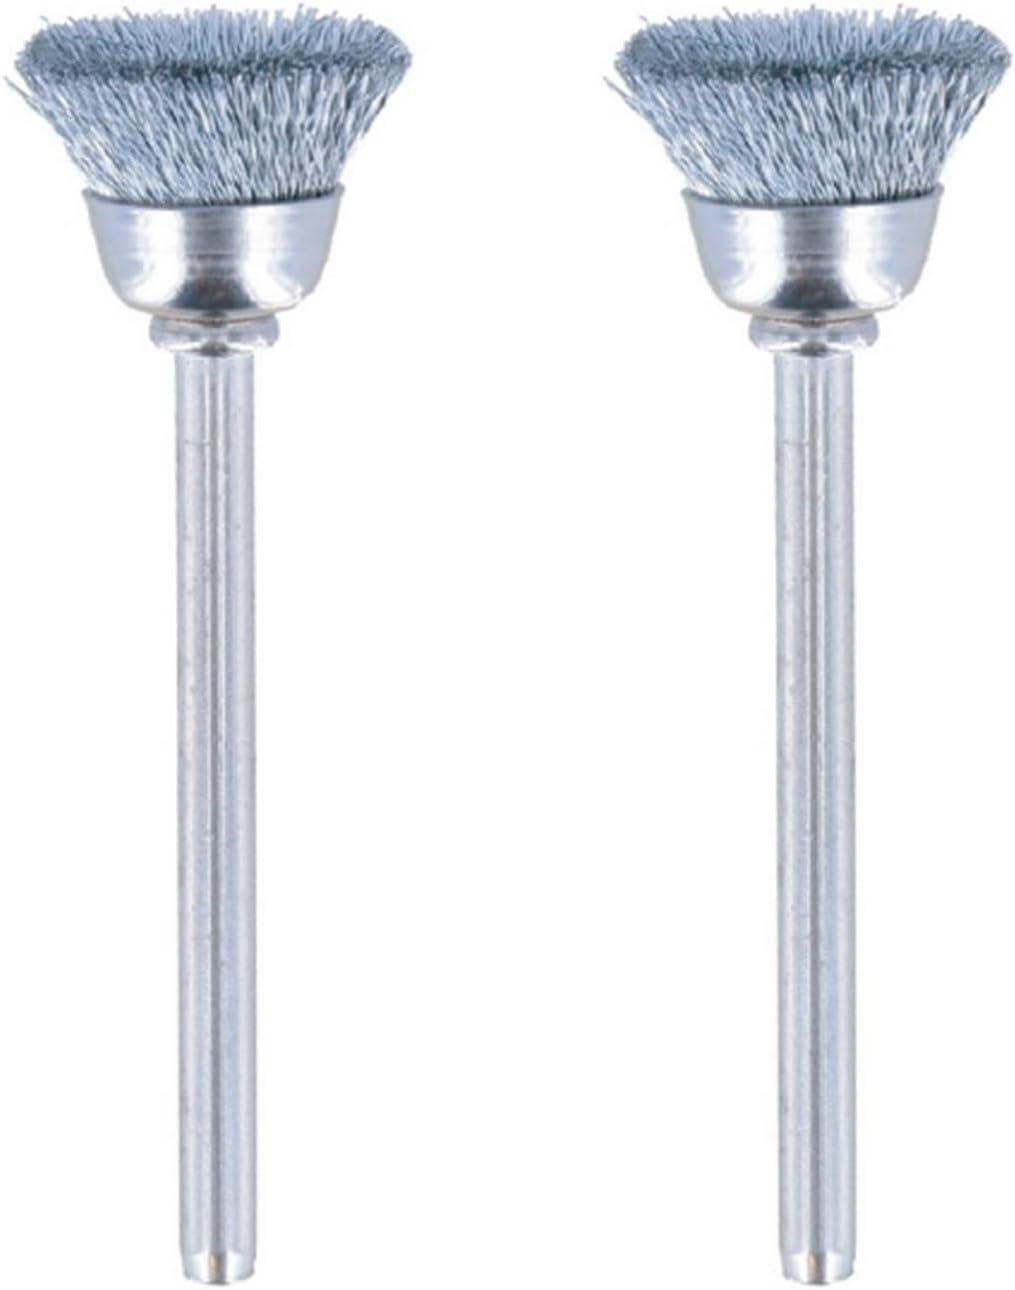 Dremel 443-02 Carbon Steel Brushes 2 Pack 1//2